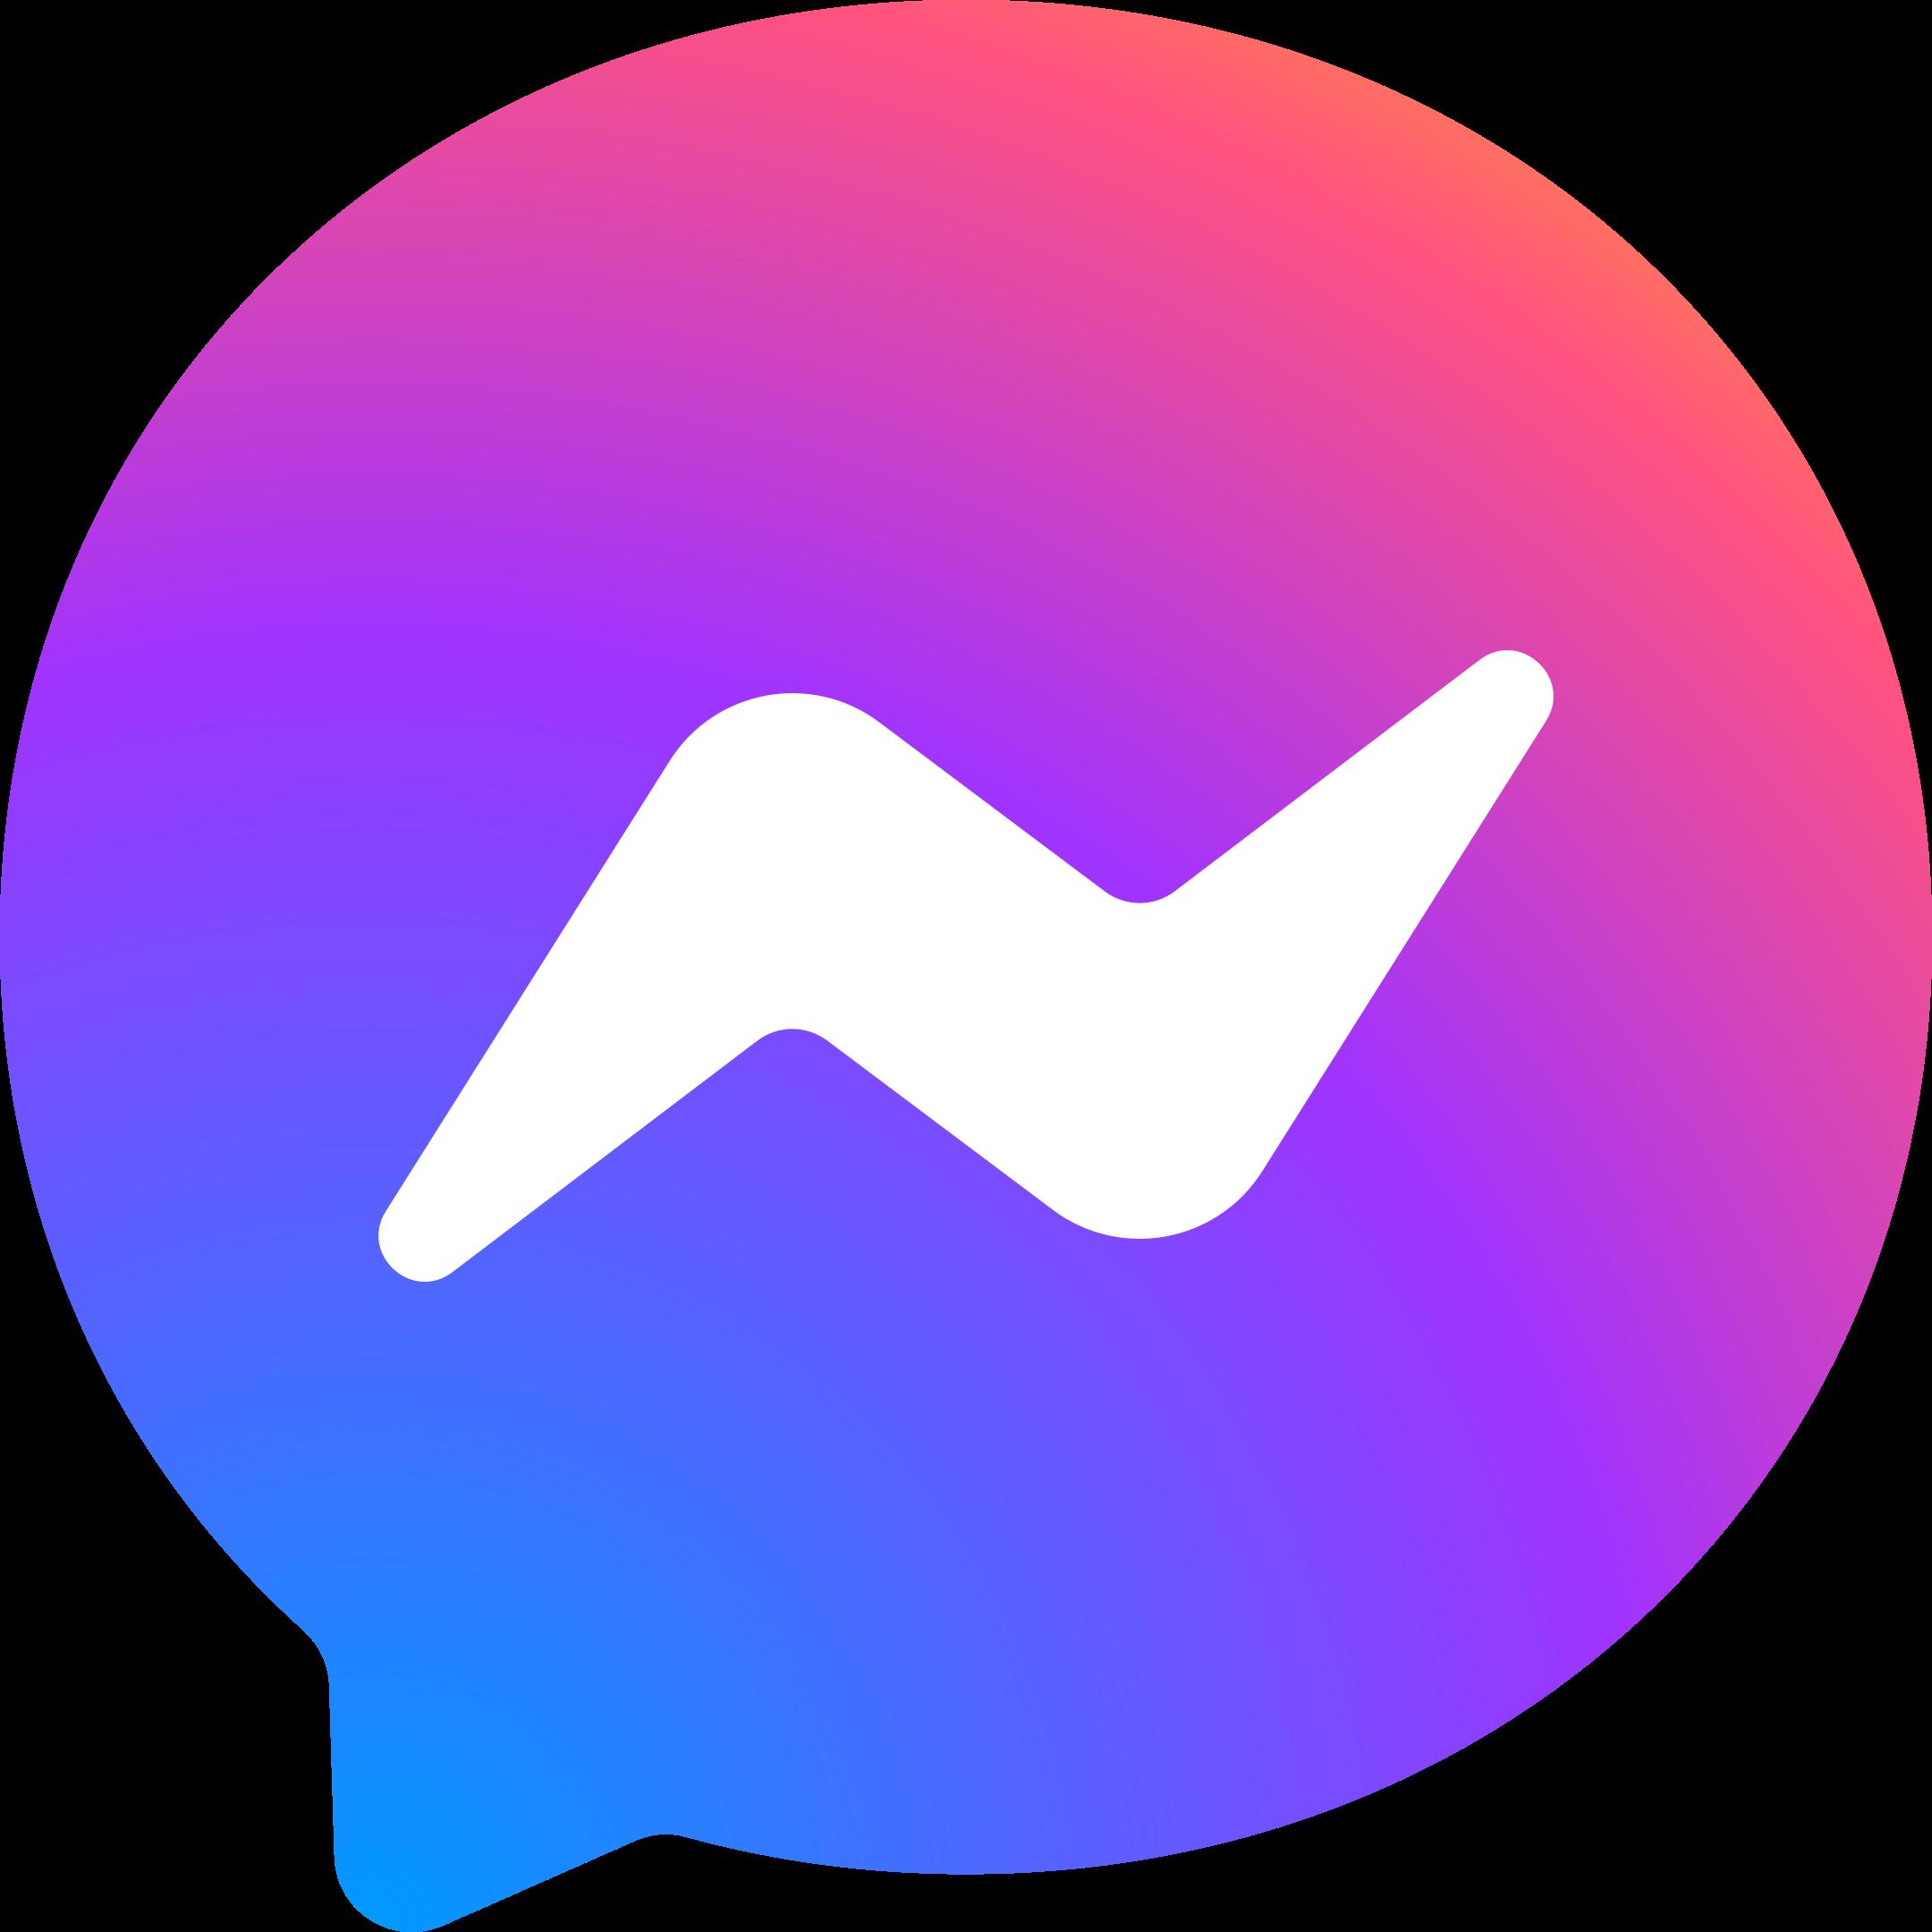 facebook messenger logo 1 1 - Facebook Messenger Logo